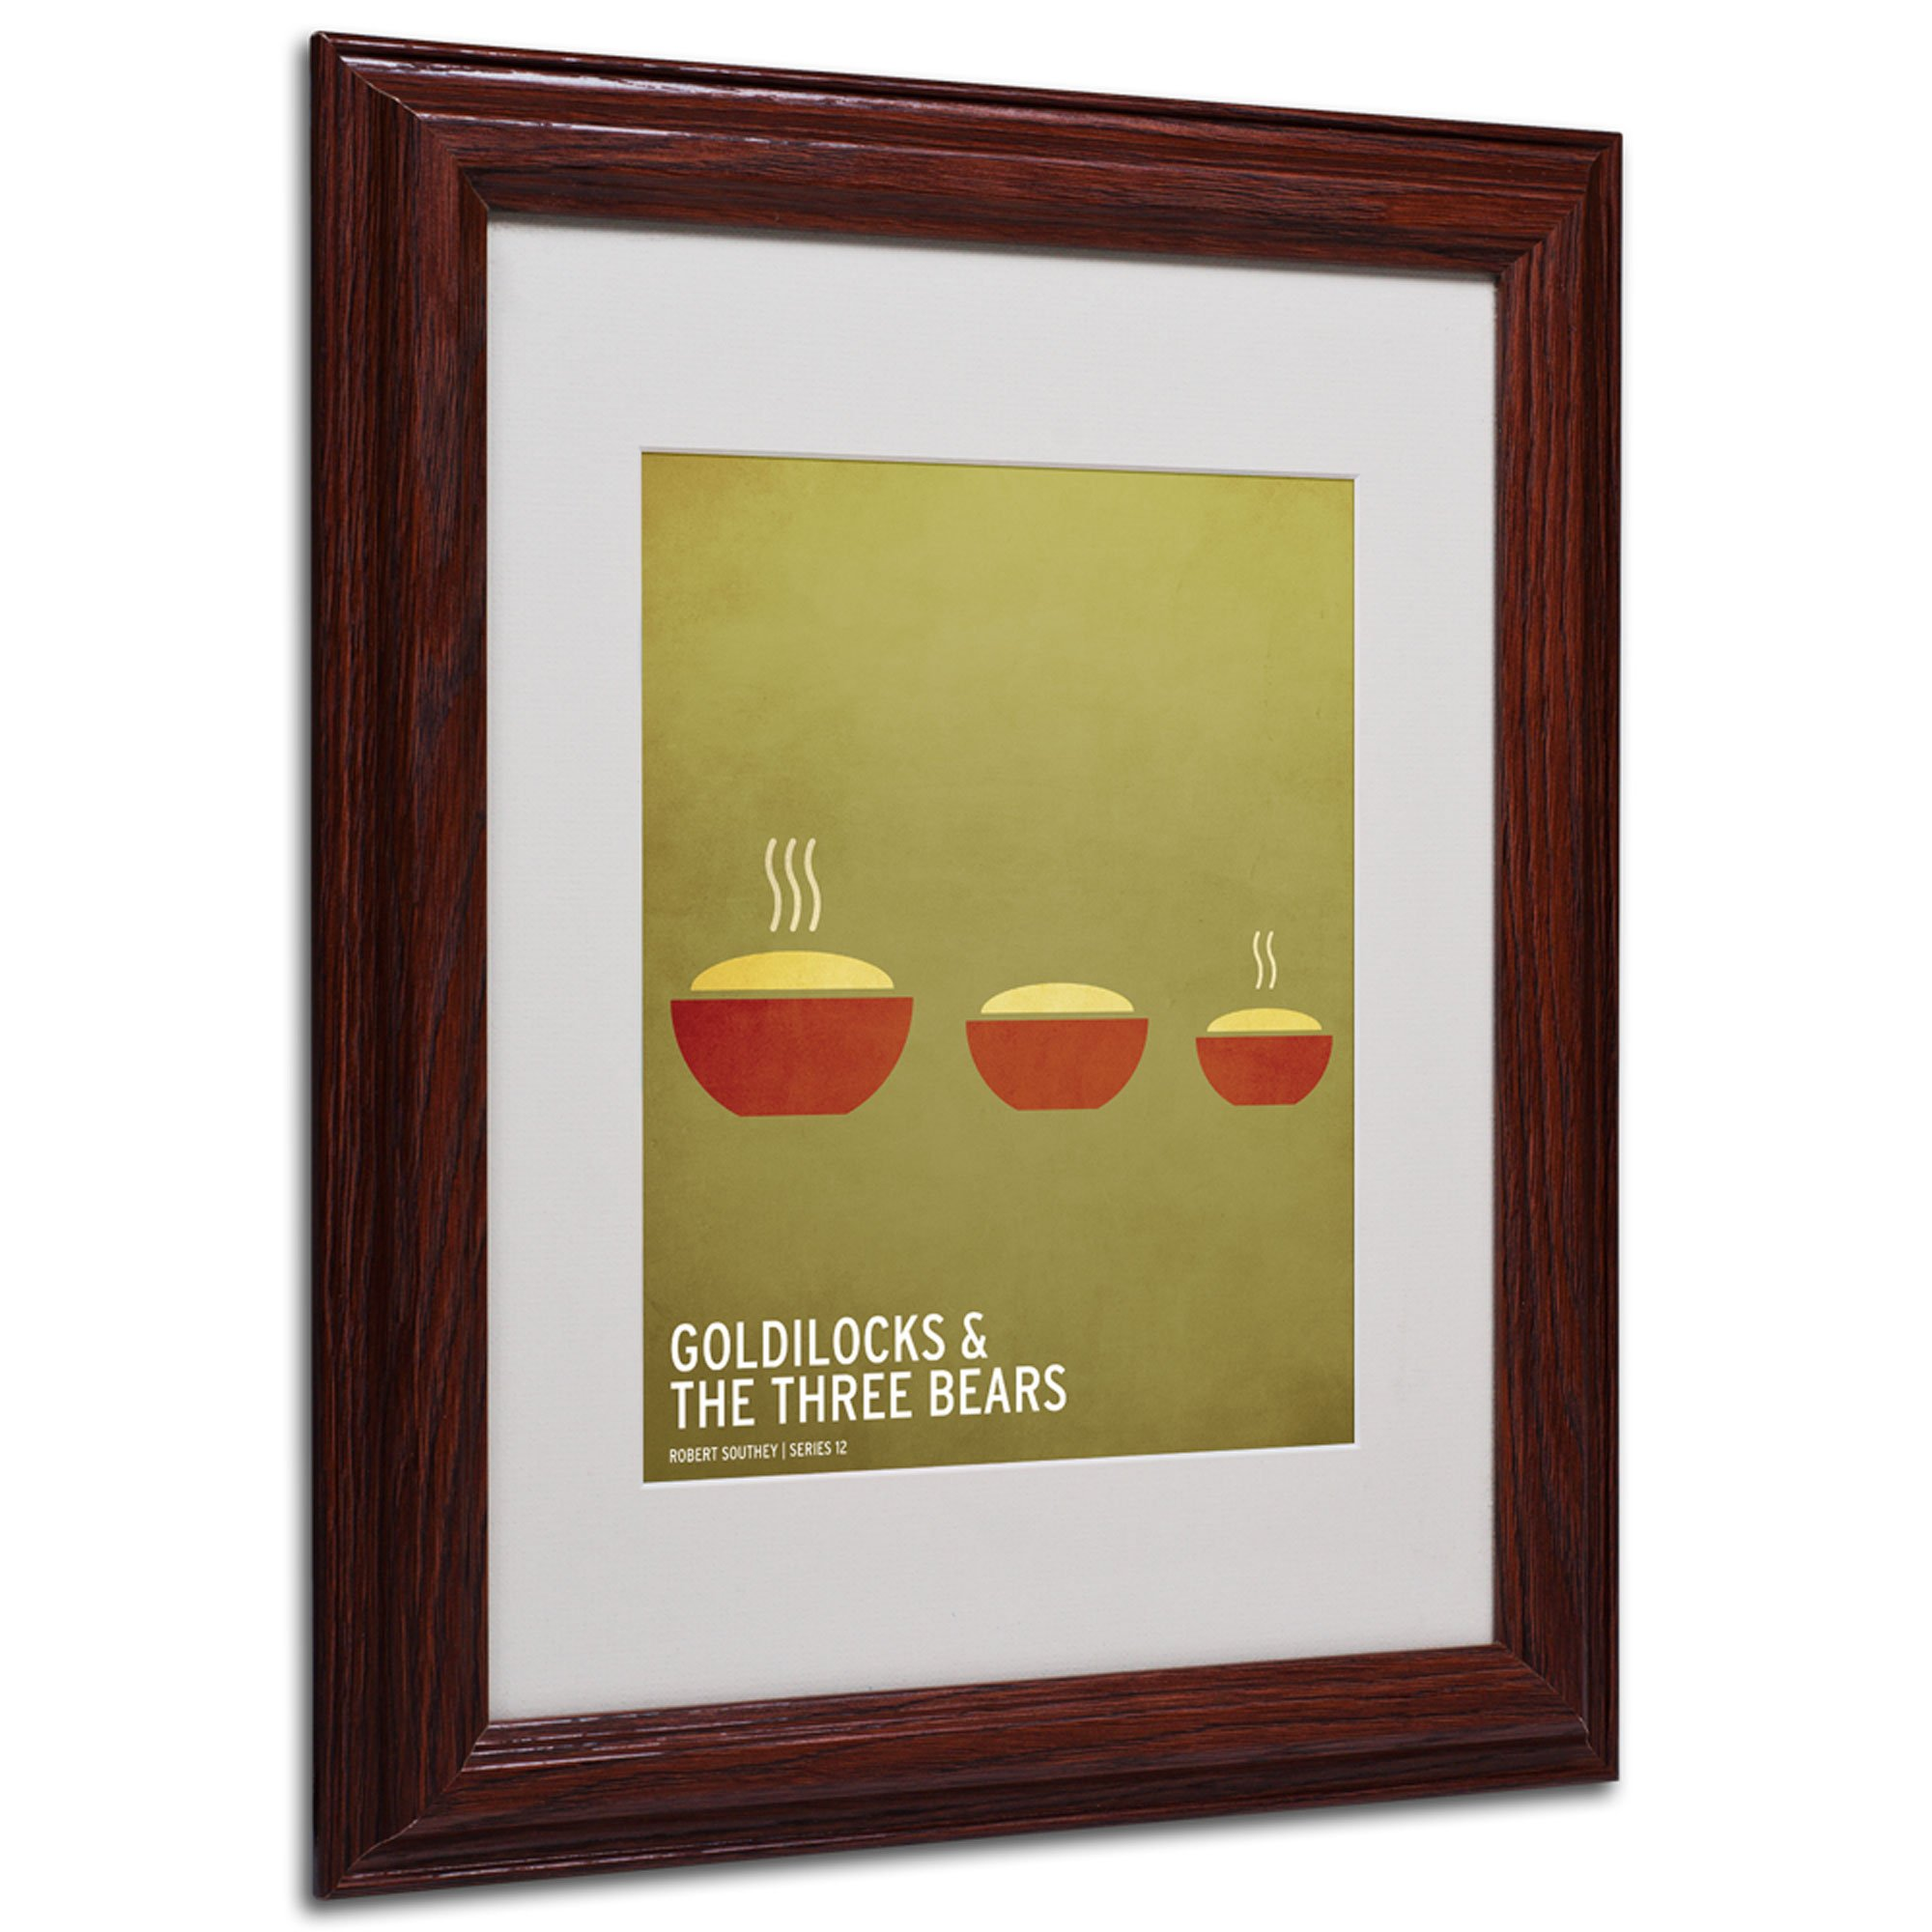 Gold Ornate Frameilocks Artwork by Christian Jackson in Wood Frame, 11 by 14-Inch